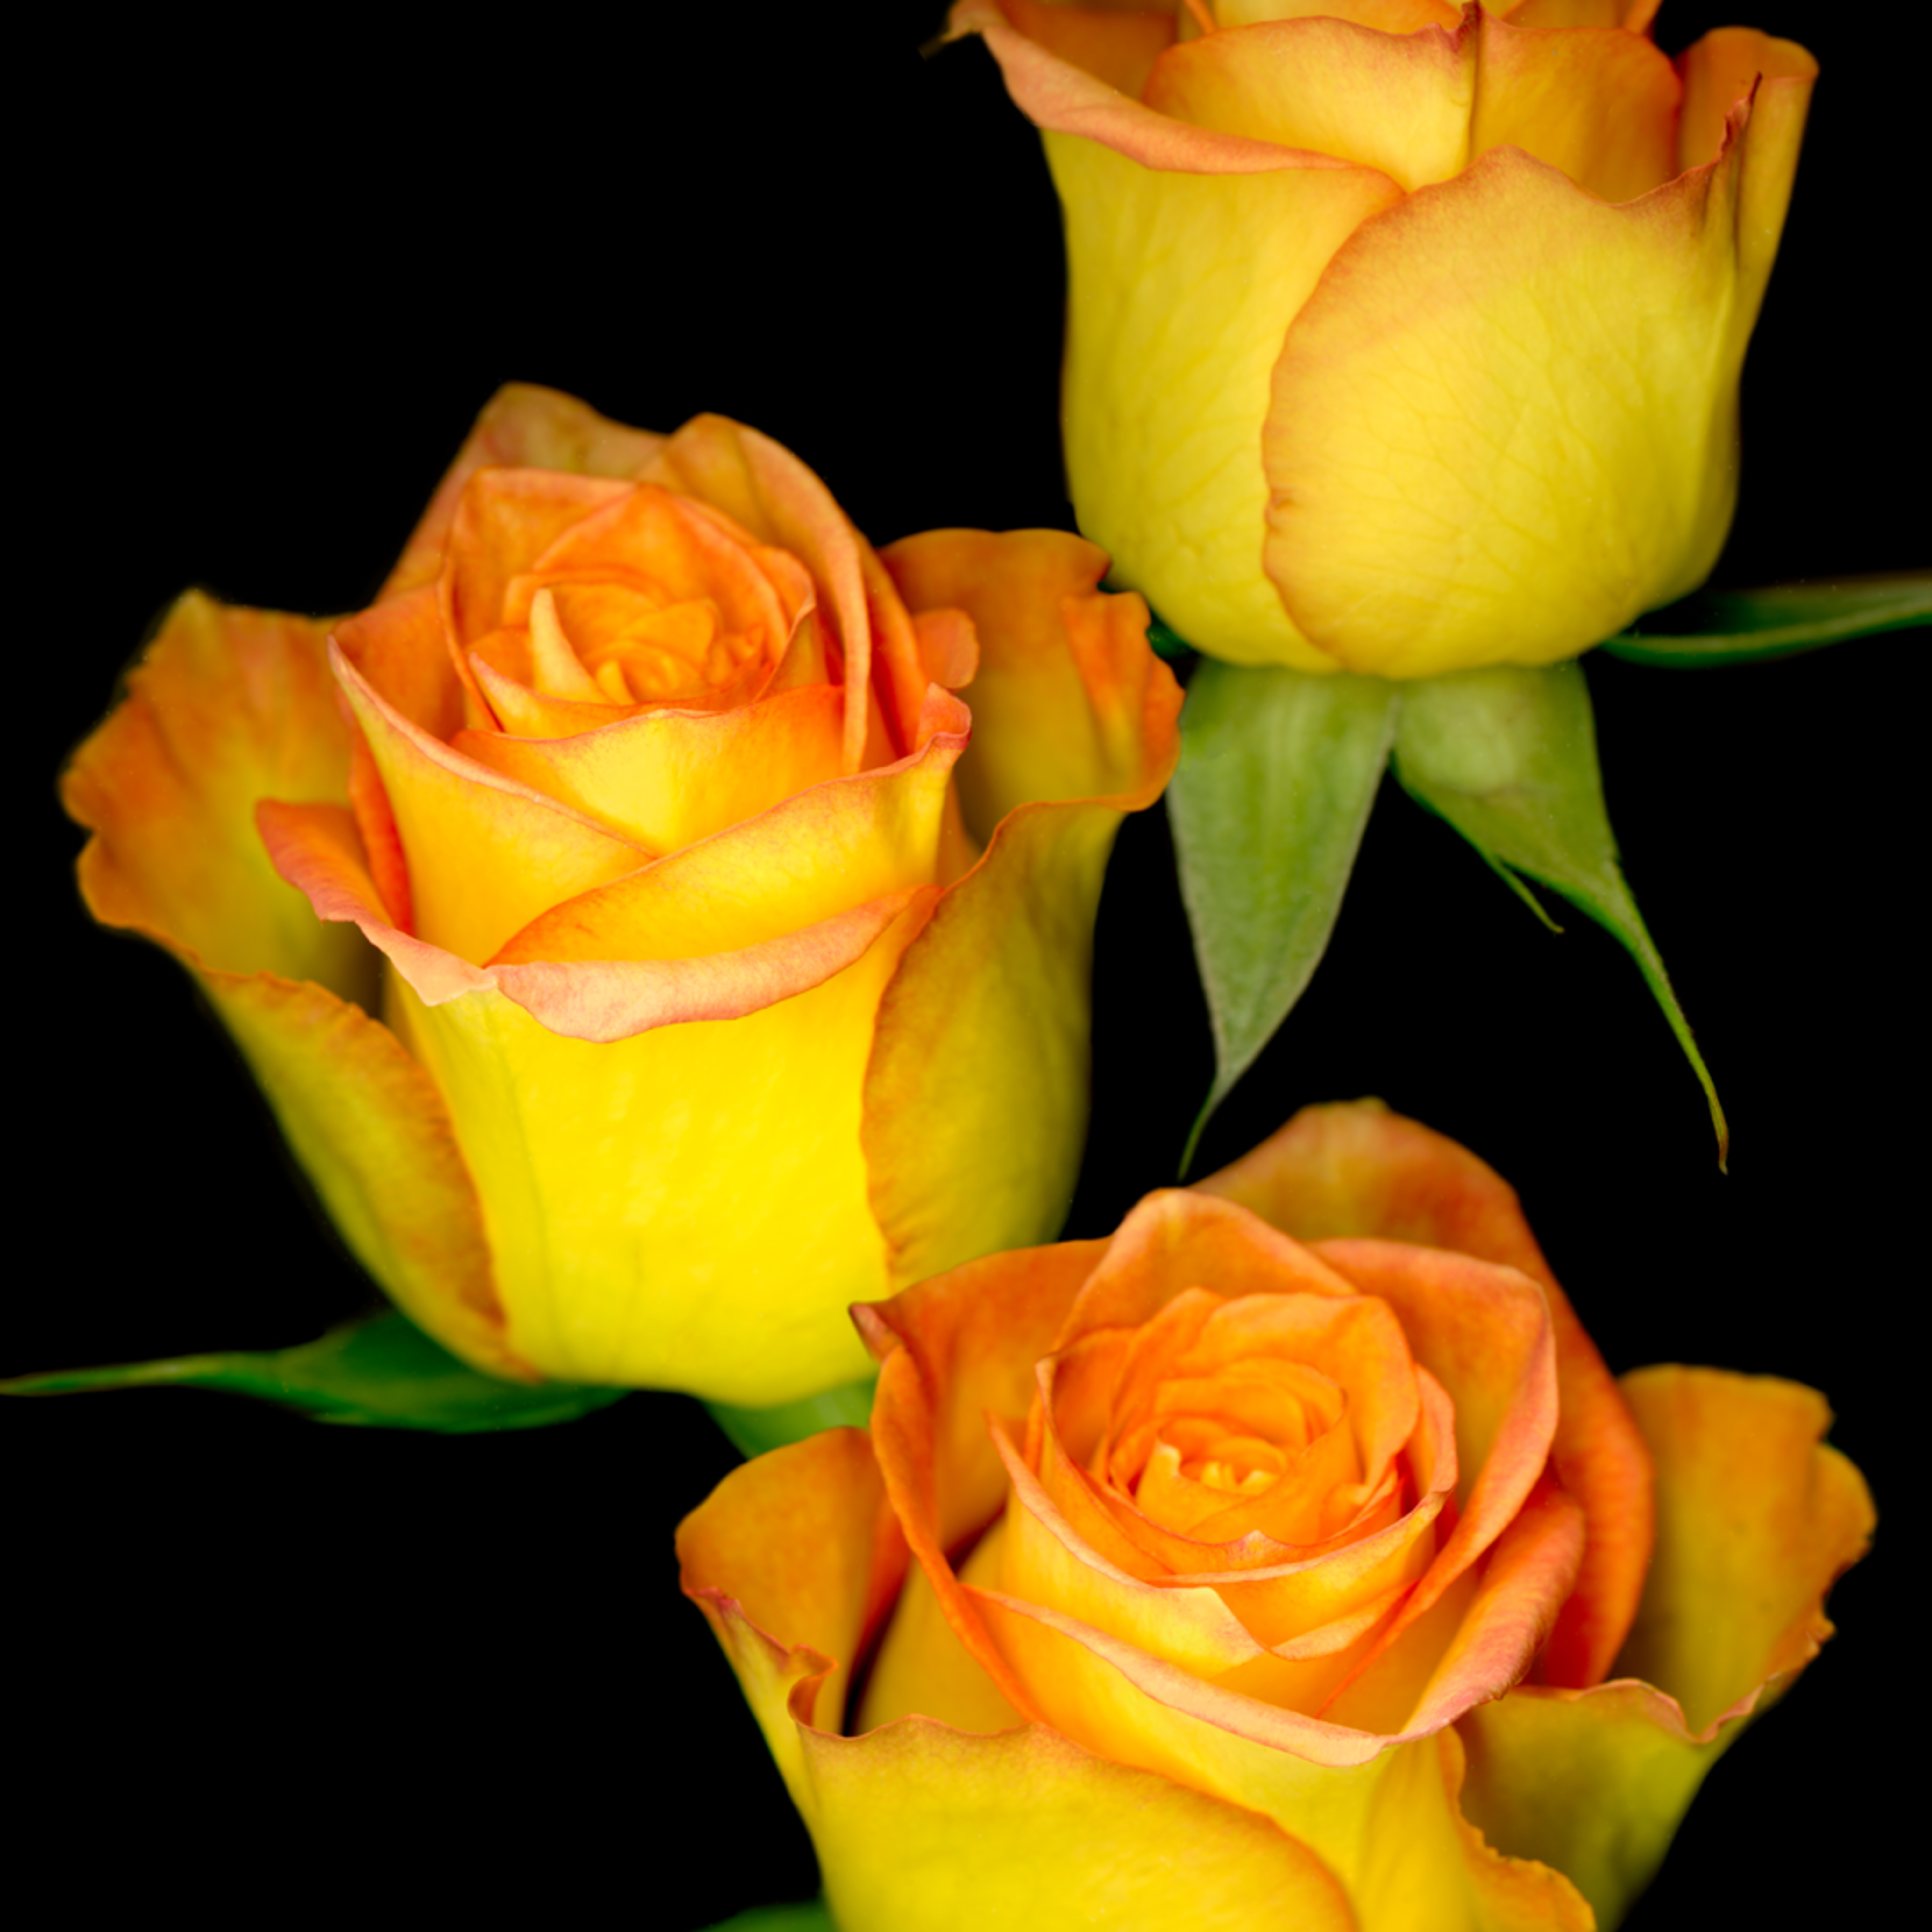 060511 ahern triple yellow roses 30x40x300 c0hvix